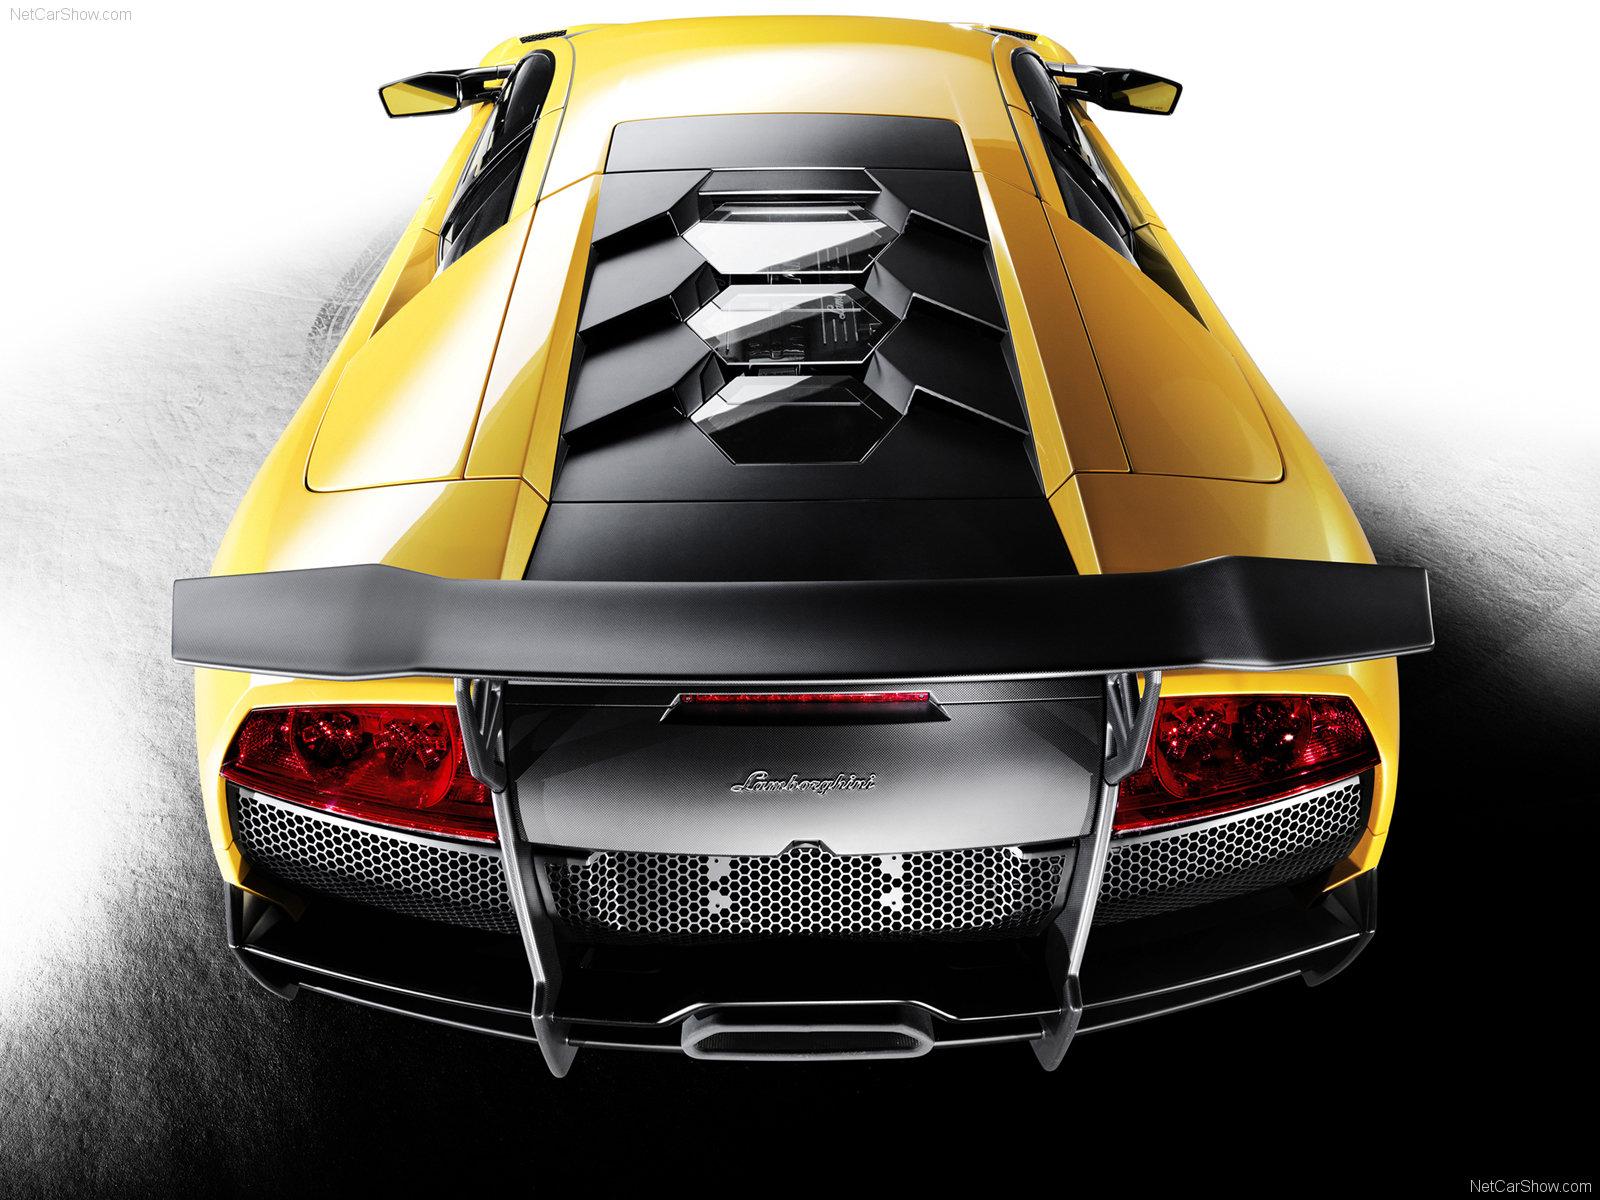 Lamborghini Murcielago LP670-4 SuperVeloce photo #61886